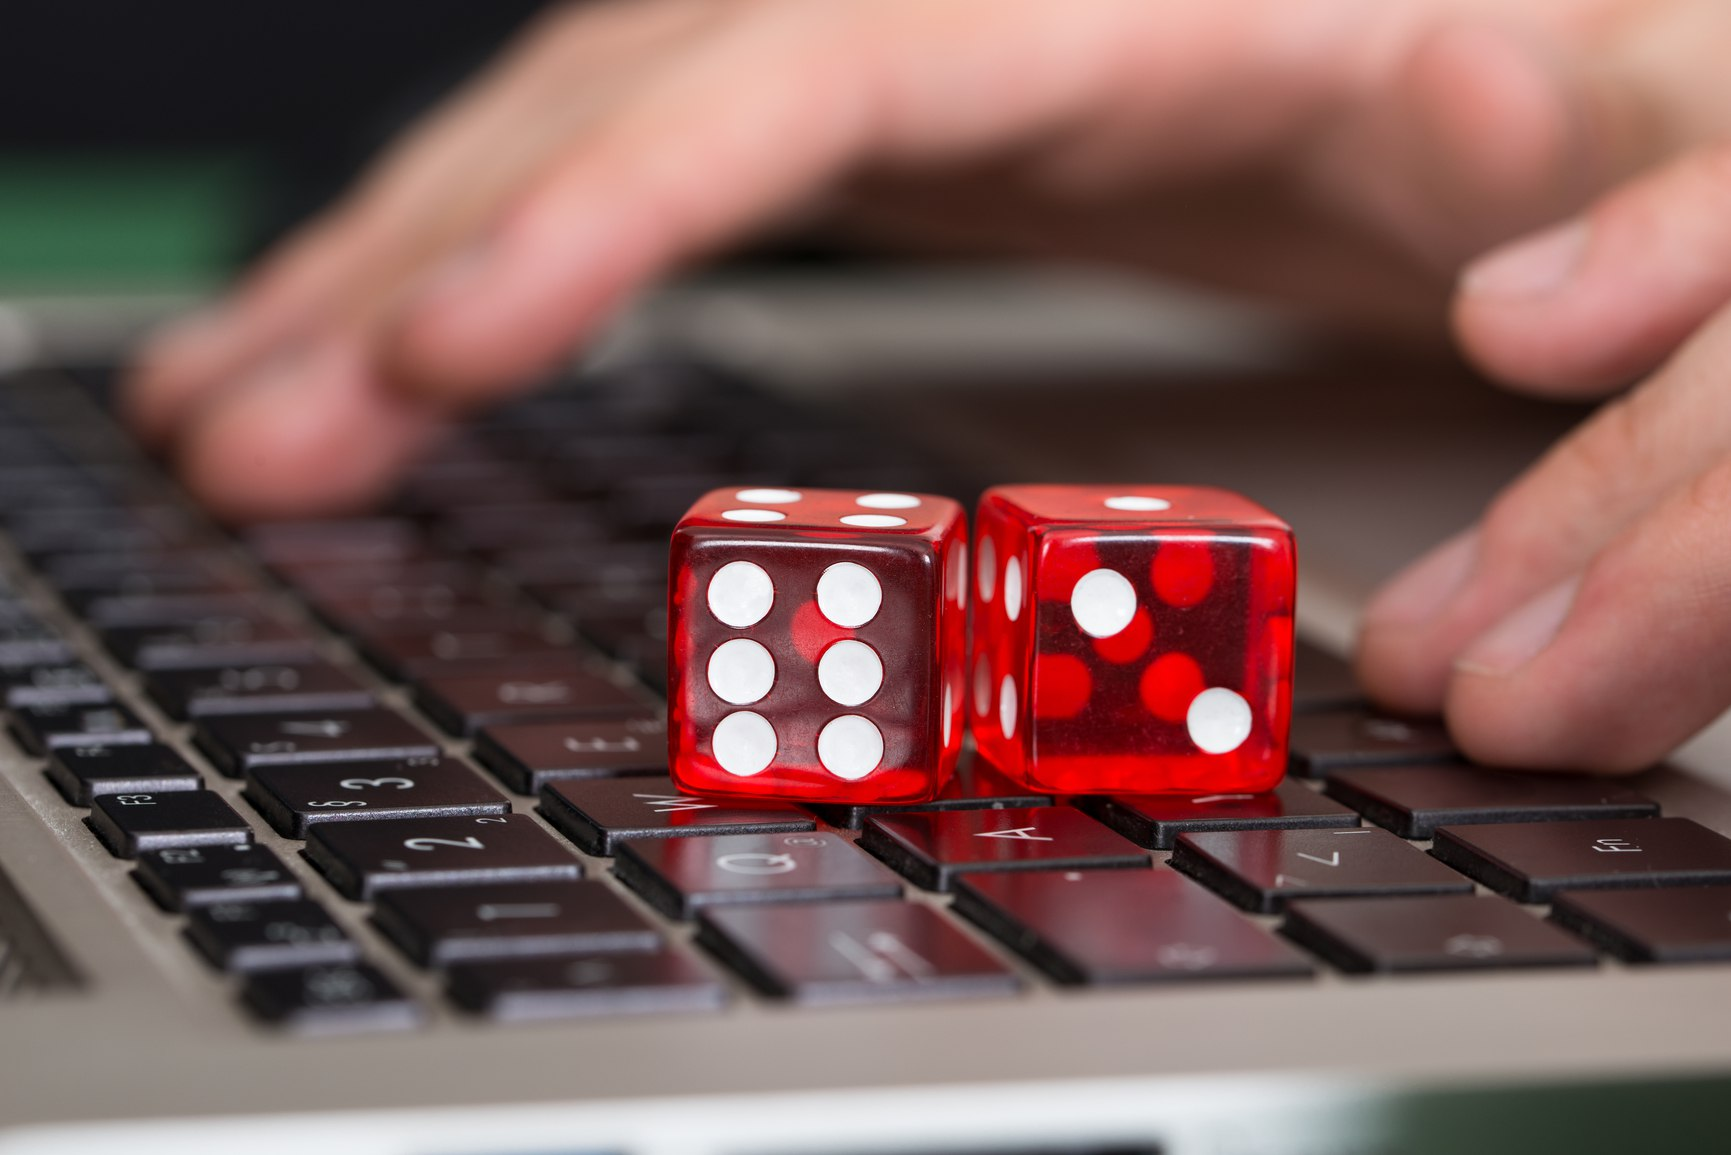 Рост индустрии онлайн-казино